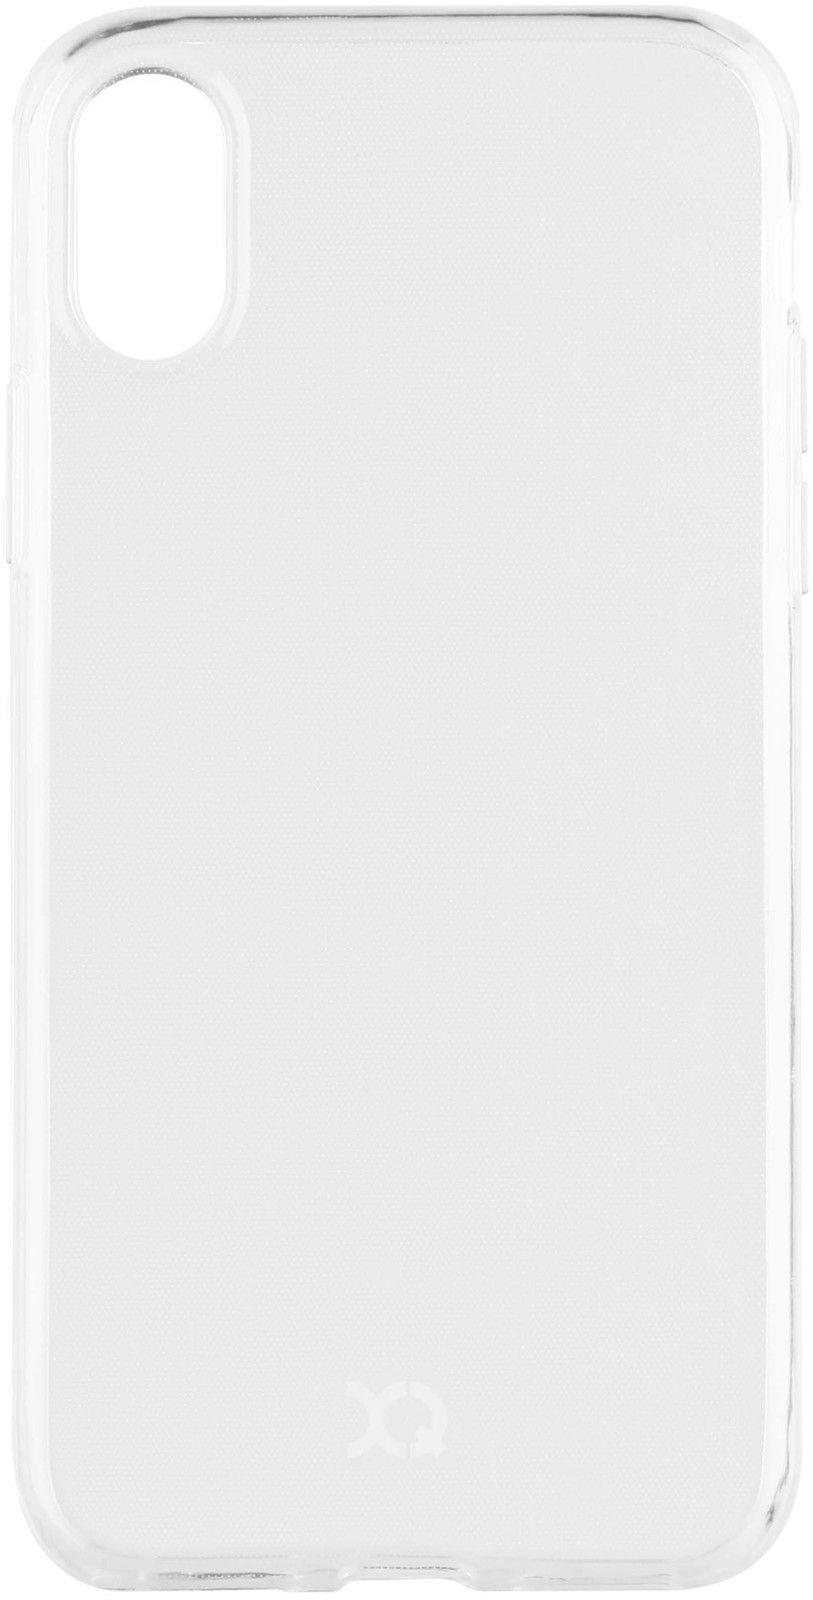 Xqisit Flex Case (iPhone Xs Max)